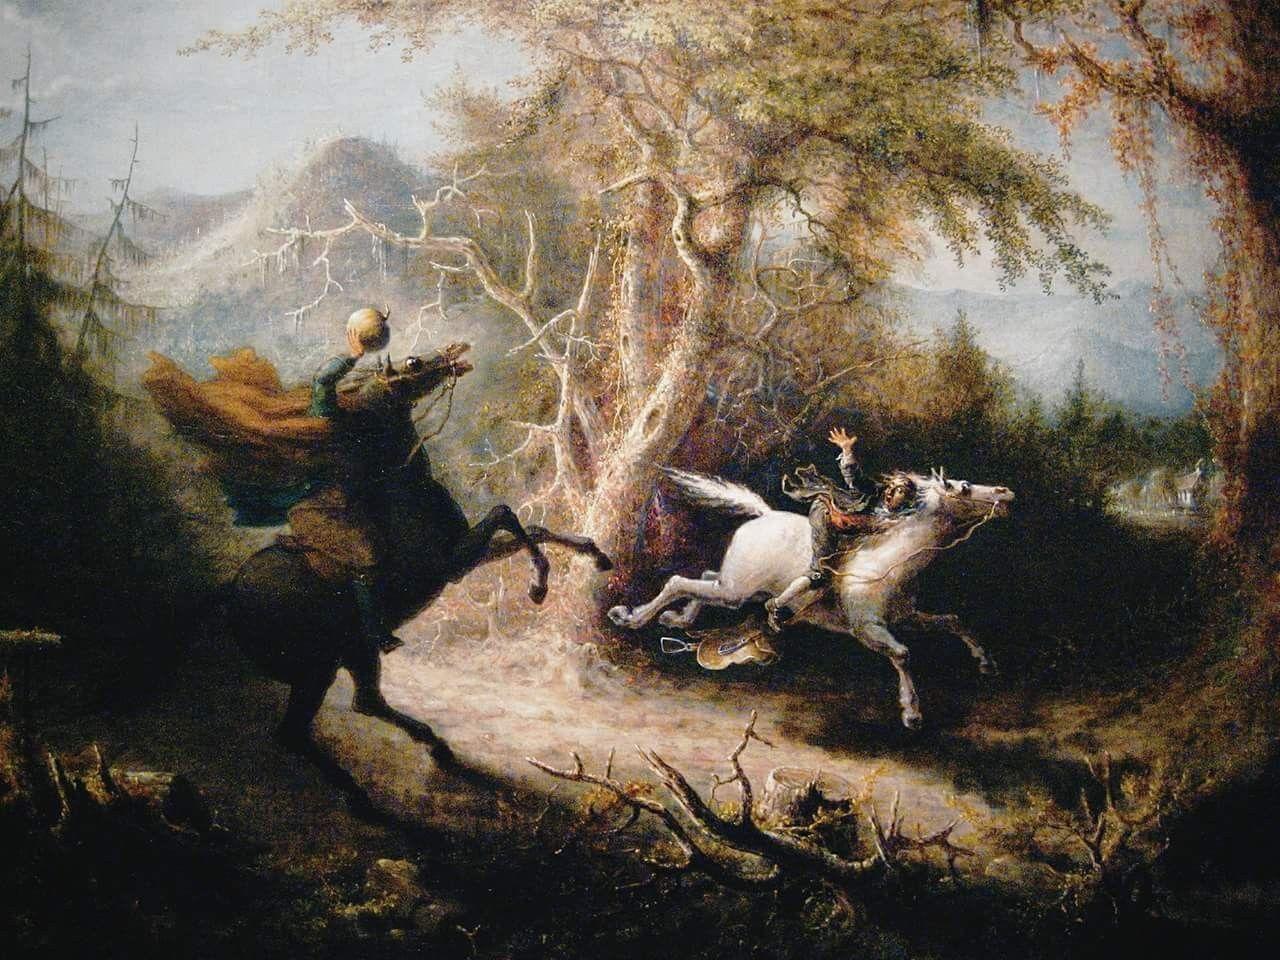 The Headless Horseman Pursuing Ichabod Crane John Quidor